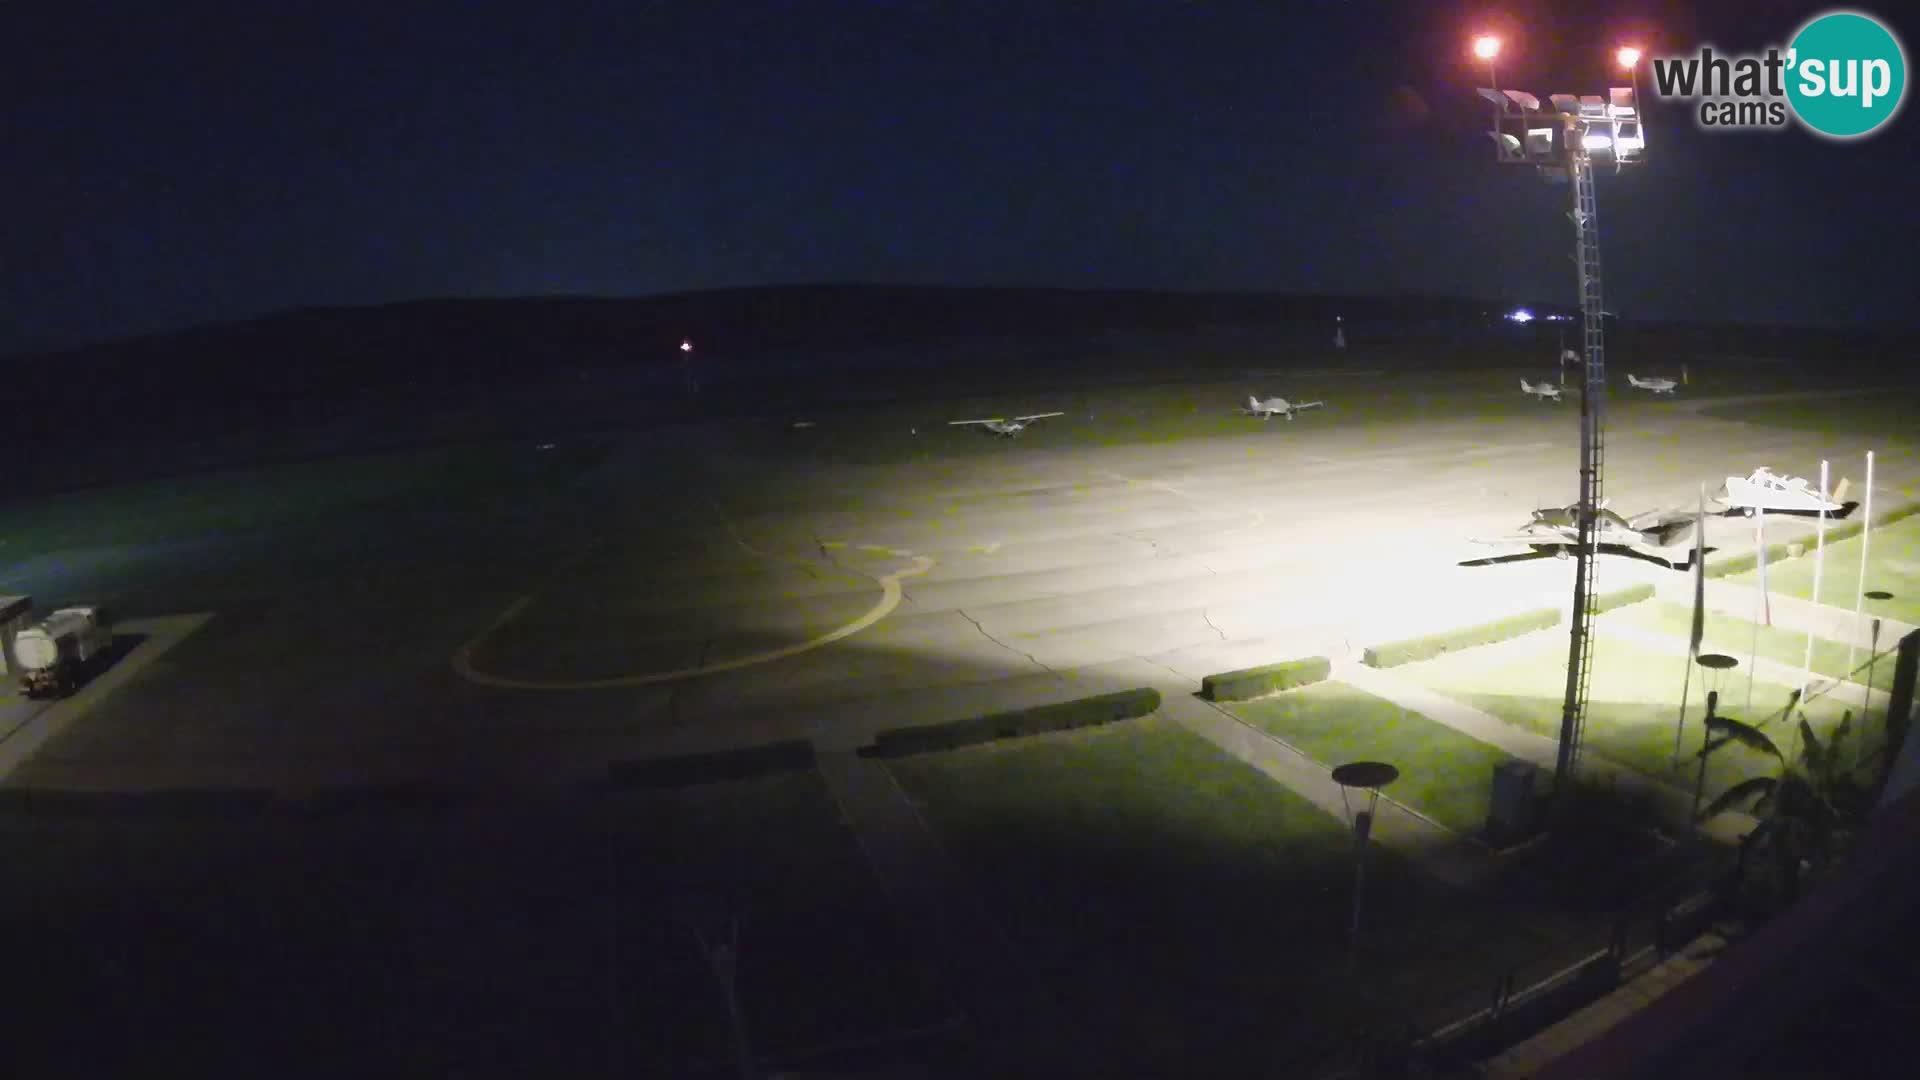 Aéroport Portorož: LJPZ